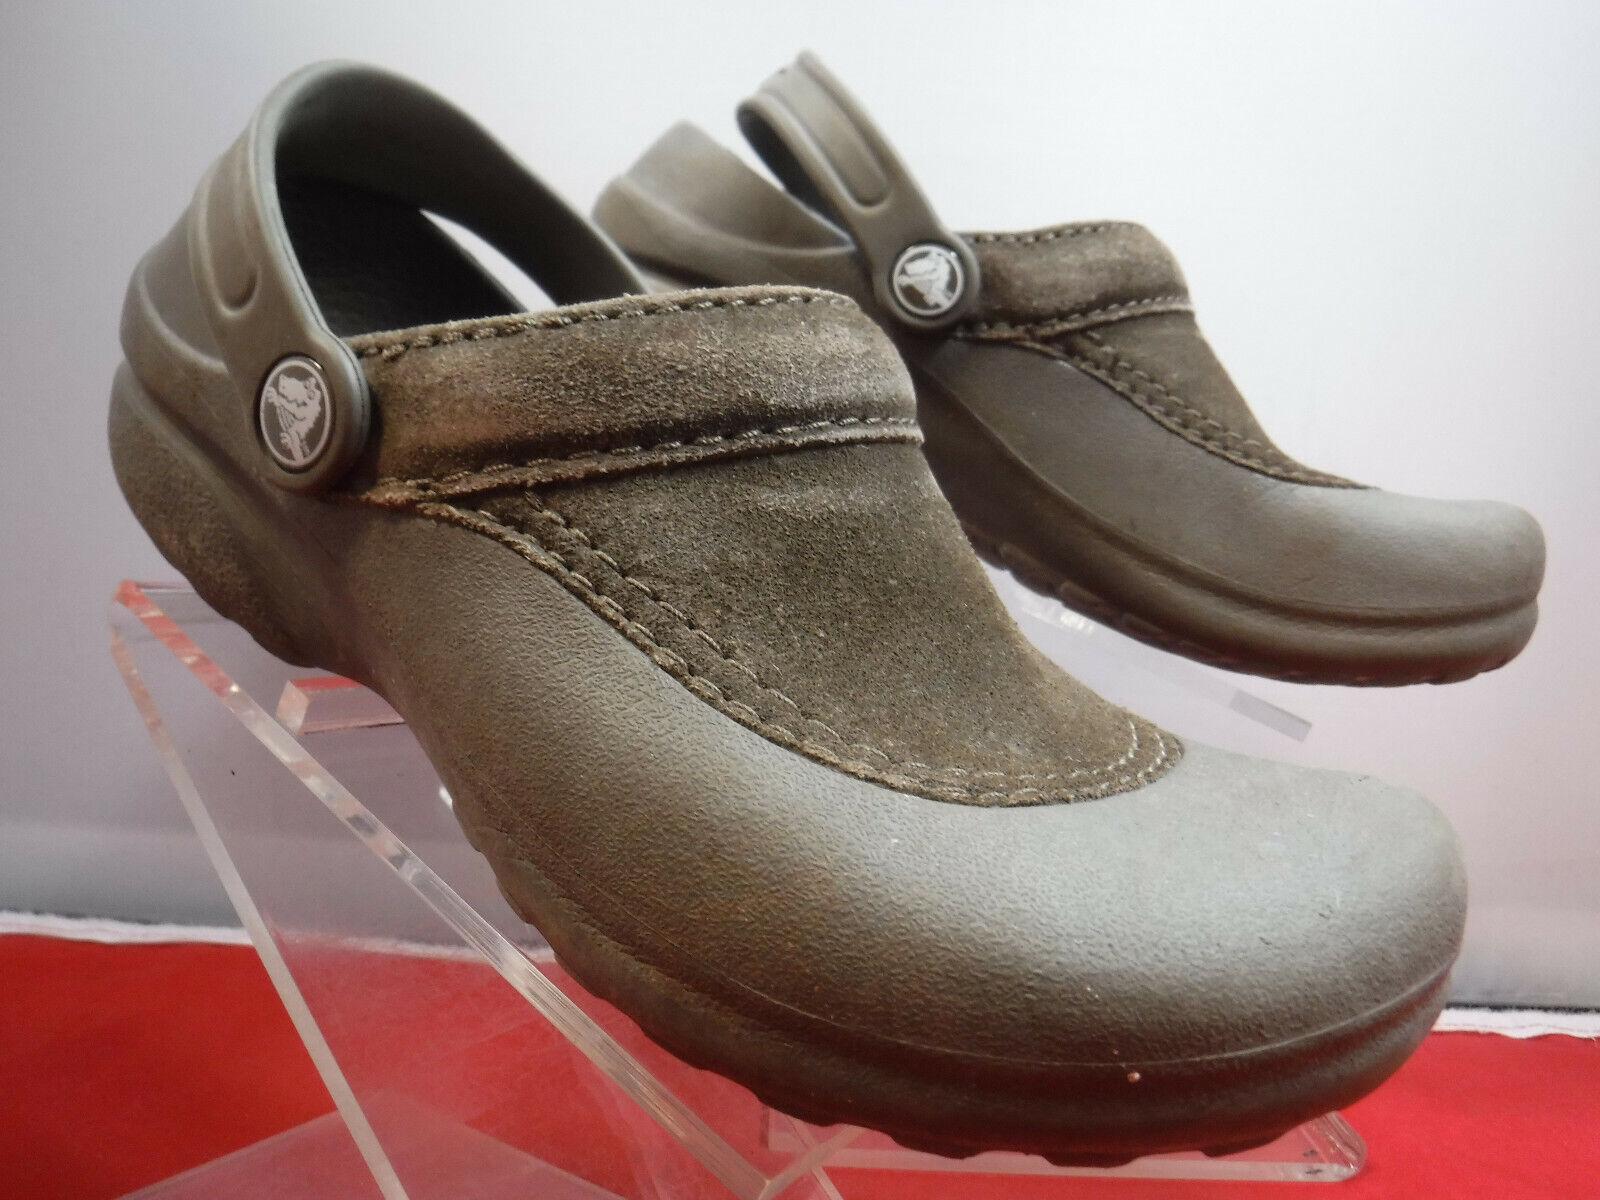 FC12 Crocs 'Troika' Suede Top Clogs W/ Heel Strap, Brown - Women's US Size 6